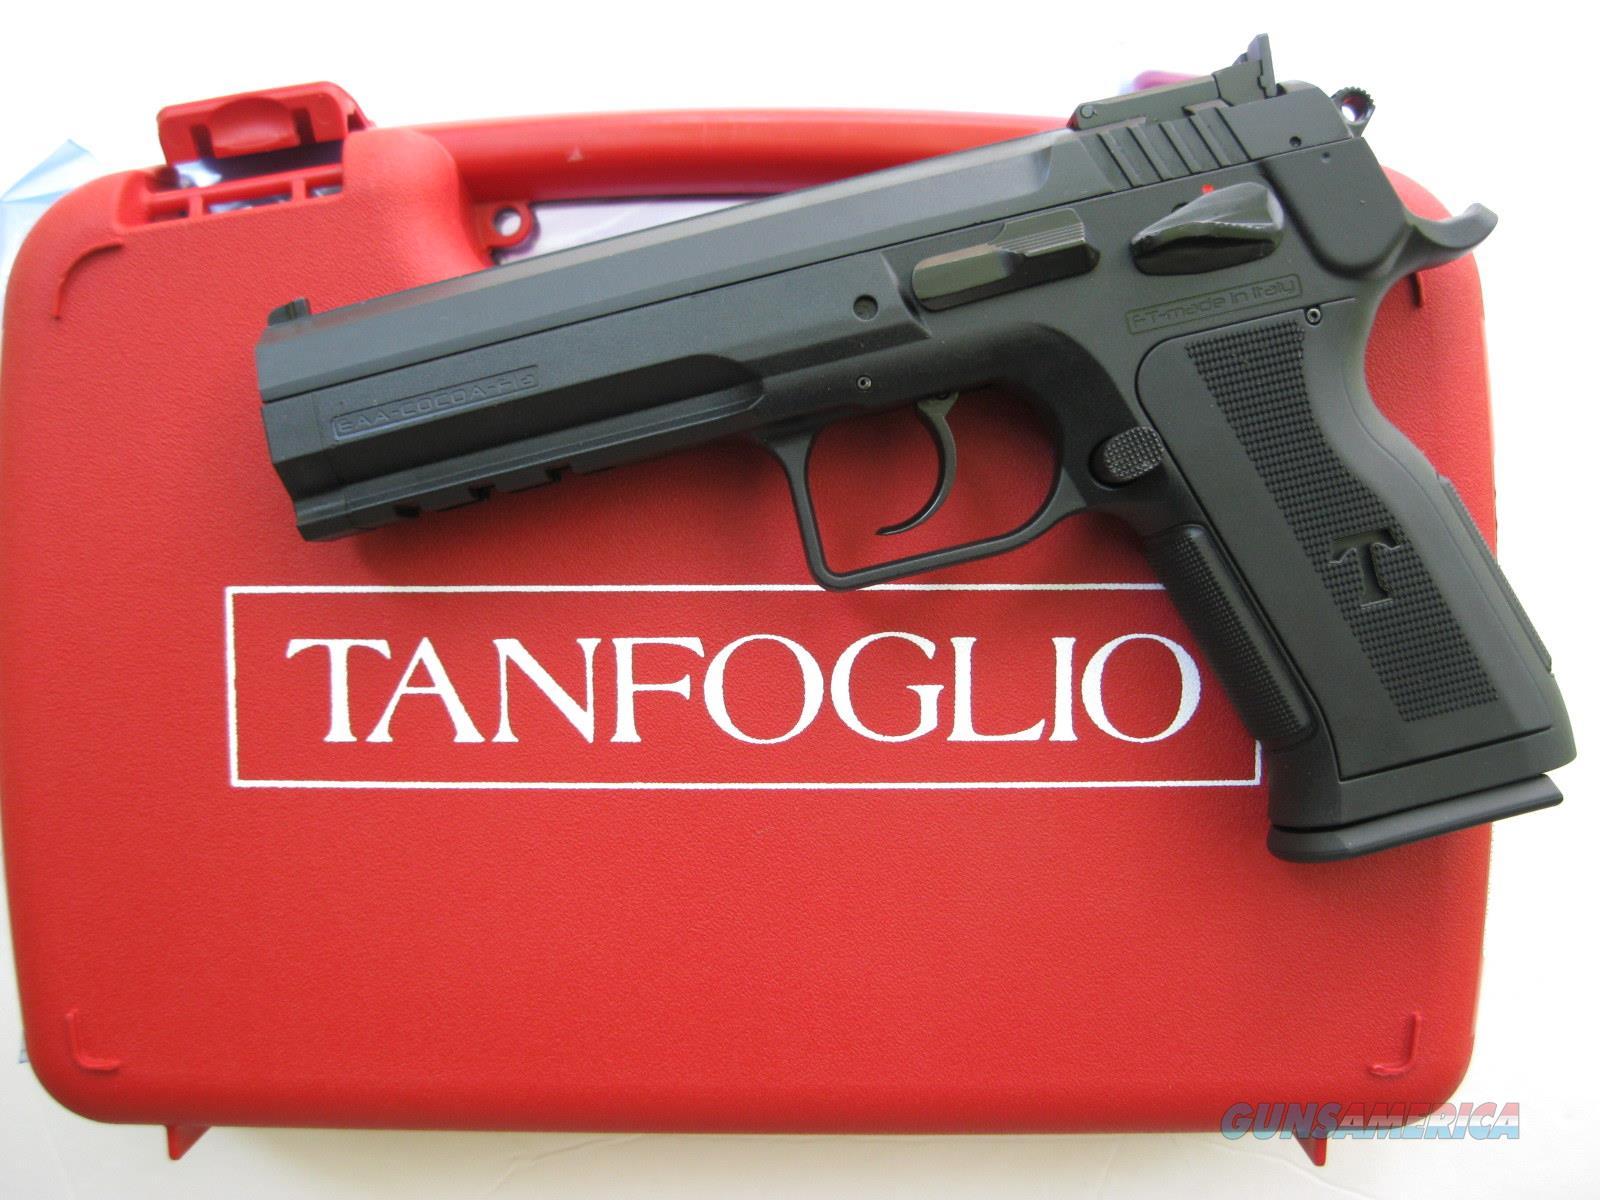 EAA Tanfoglio Polymer Match Pro 10mm 600647 *NEW*  Guns > Pistols > EAA Pistols > Other